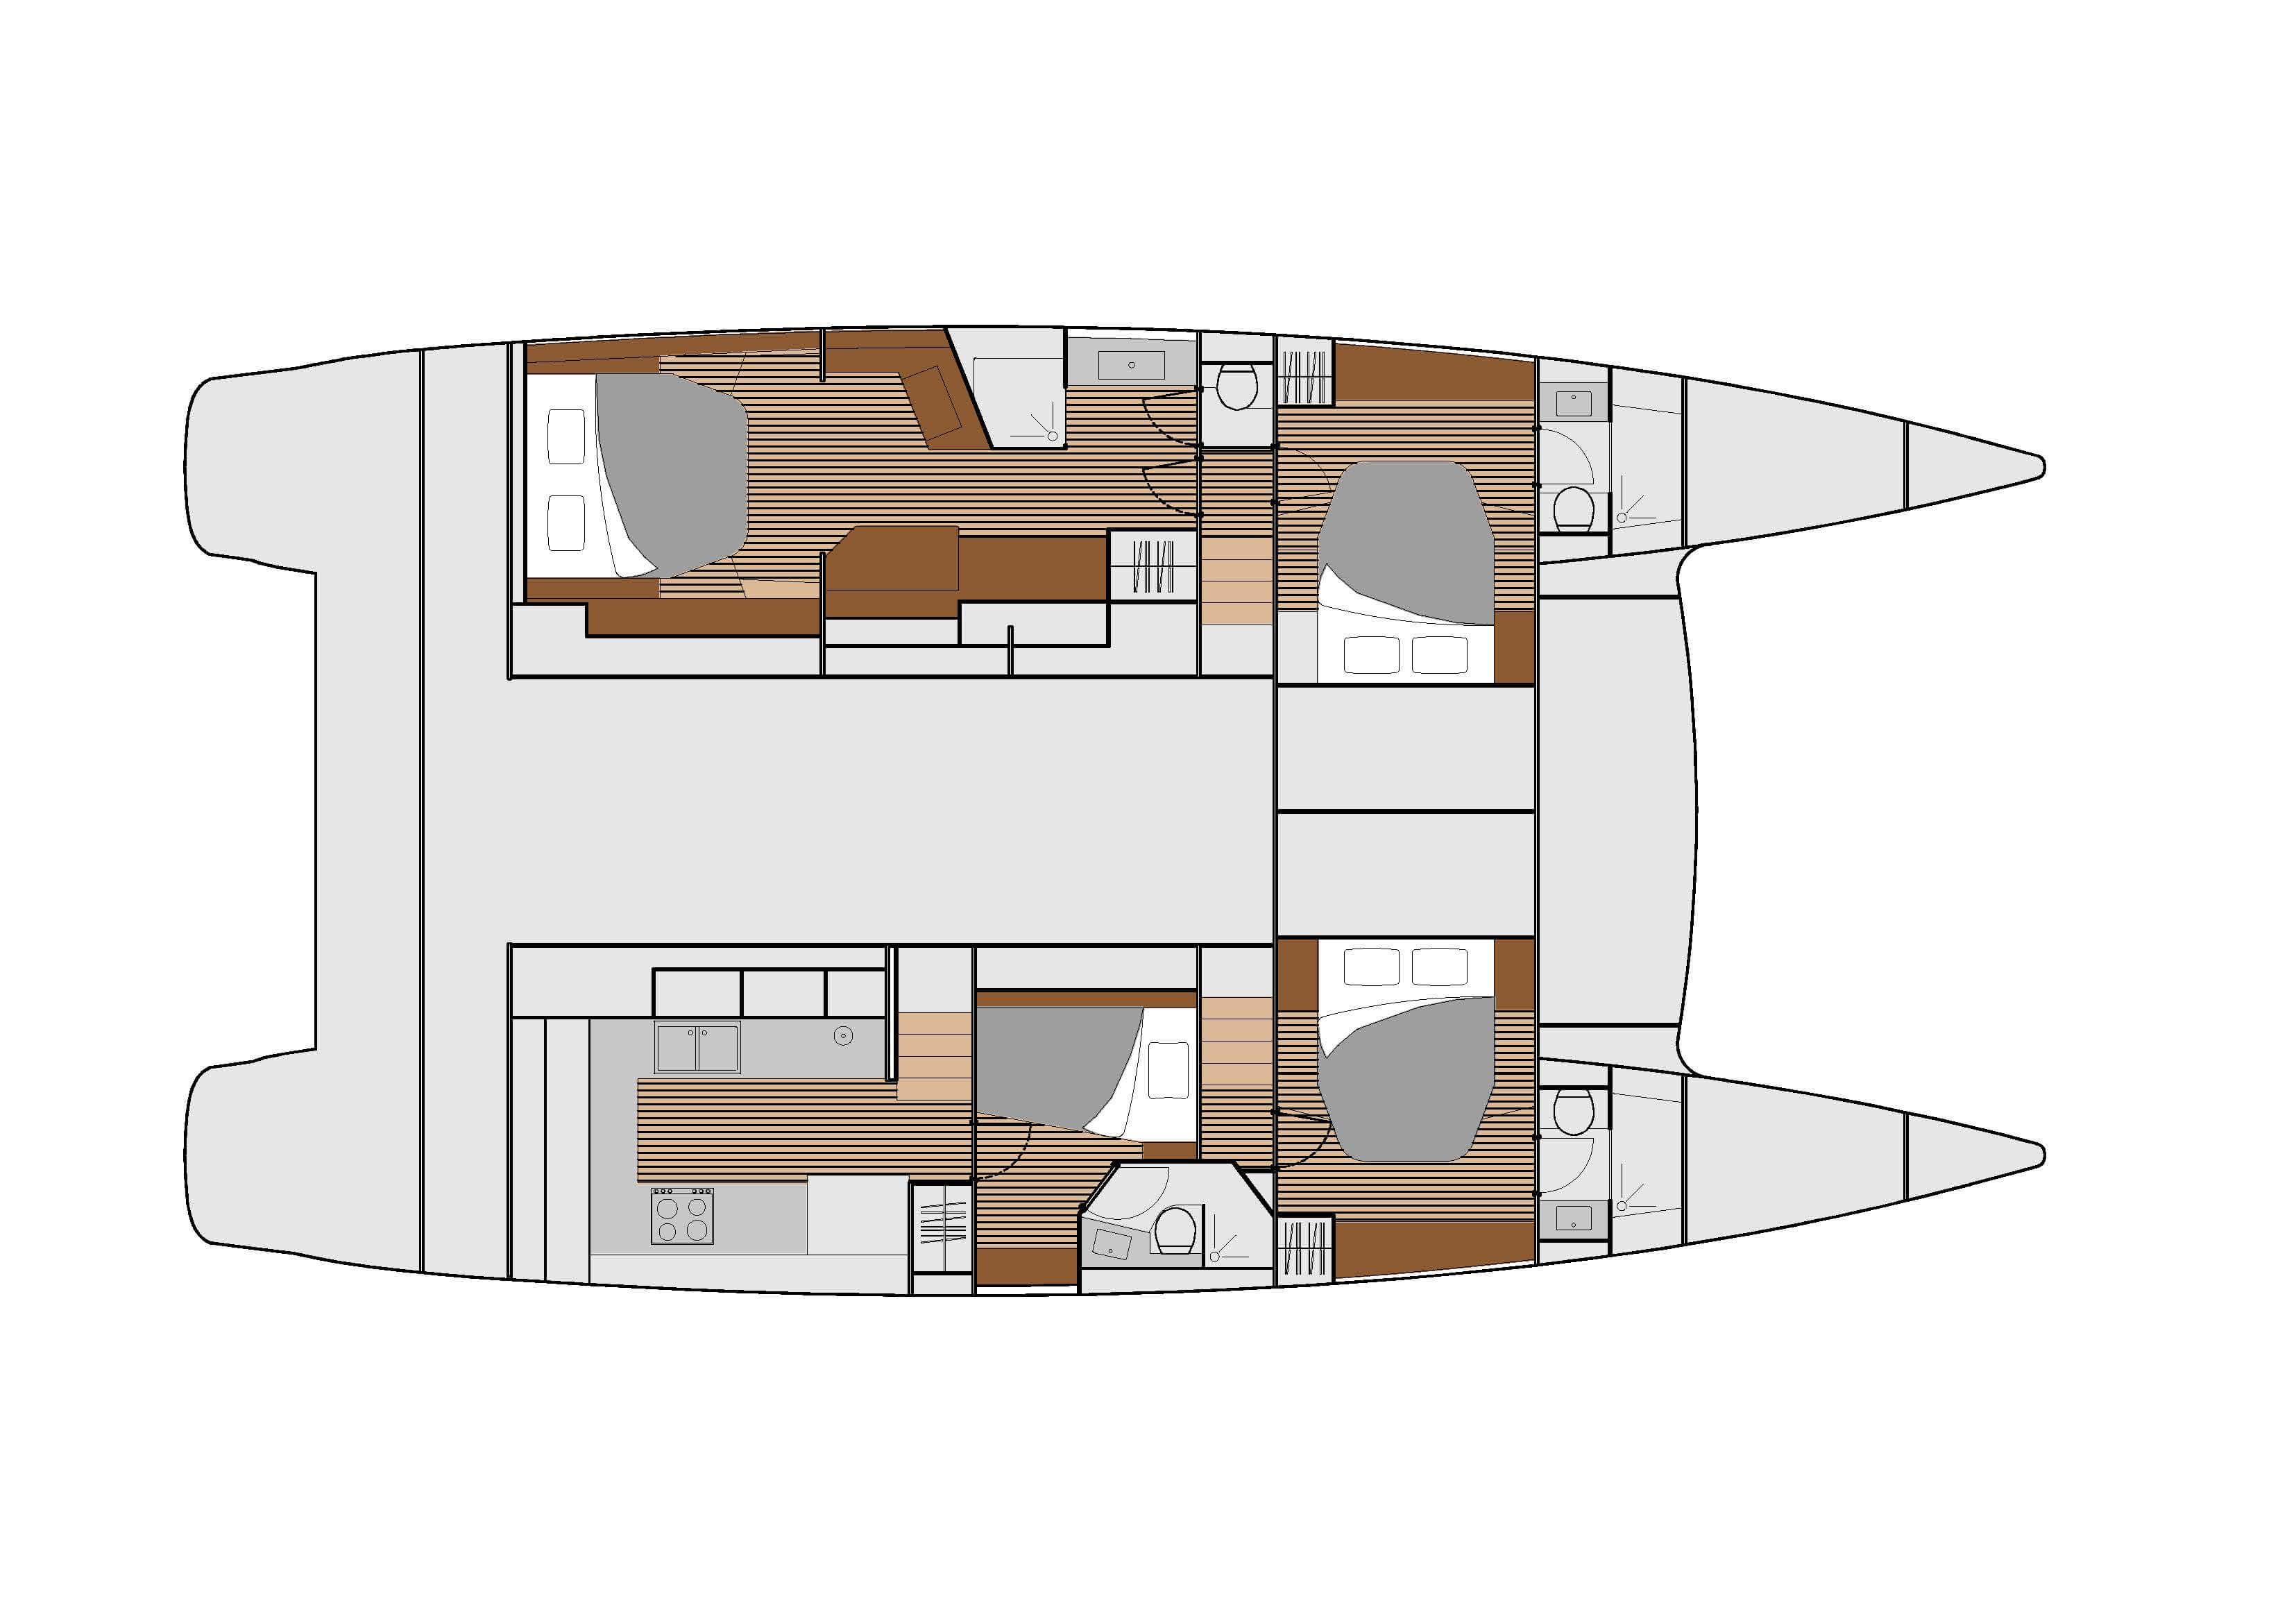 ip58-4-layout